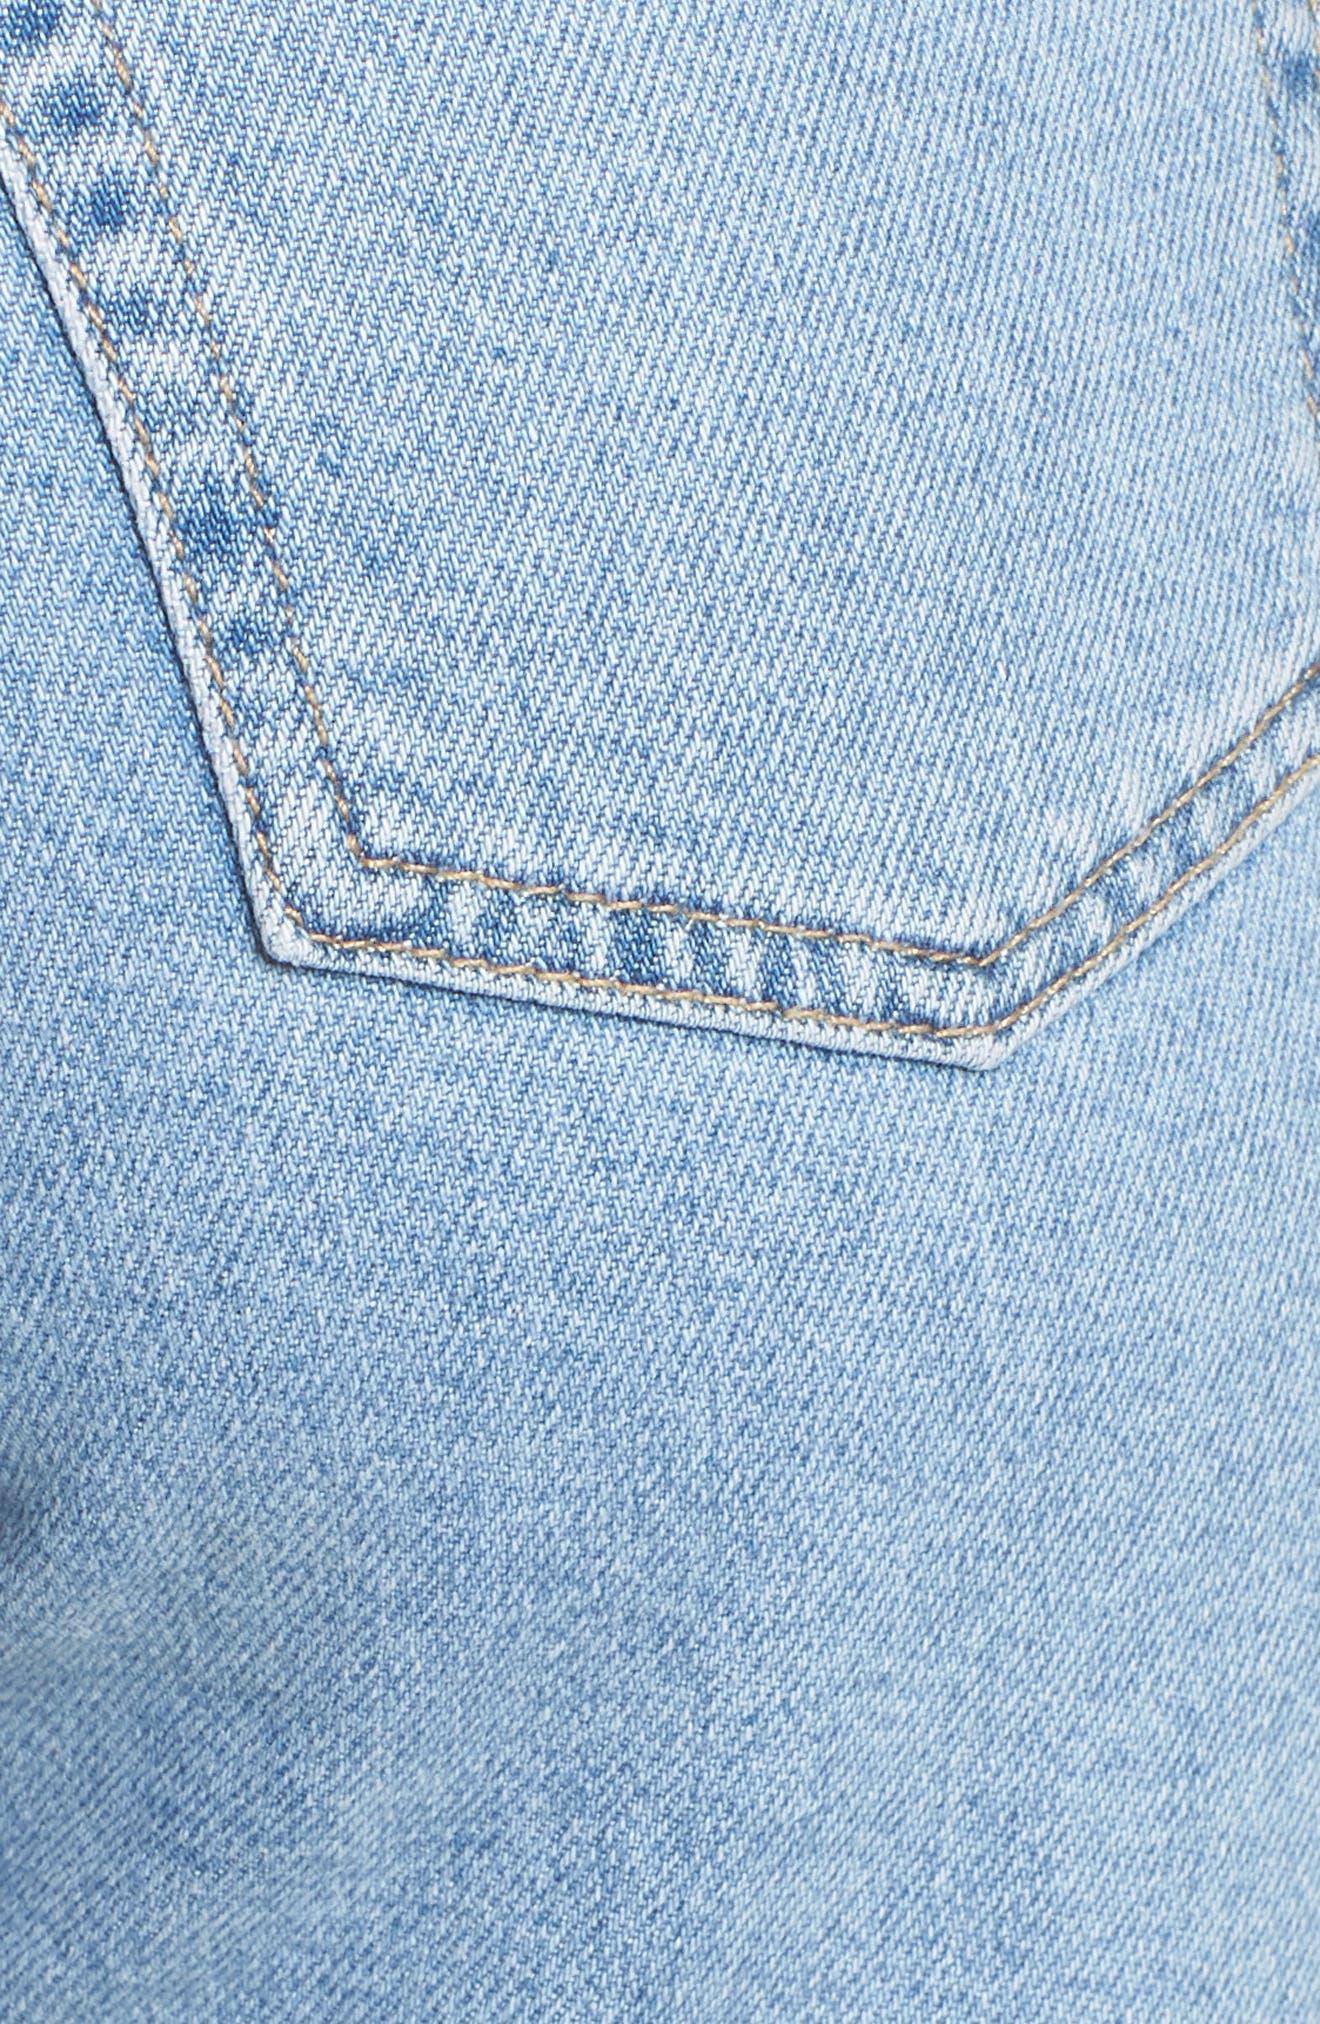 Raw Hem Straight Leg Jeans,                             Alternate thumbnail 6, color,                             BLEACH STONE DENIM